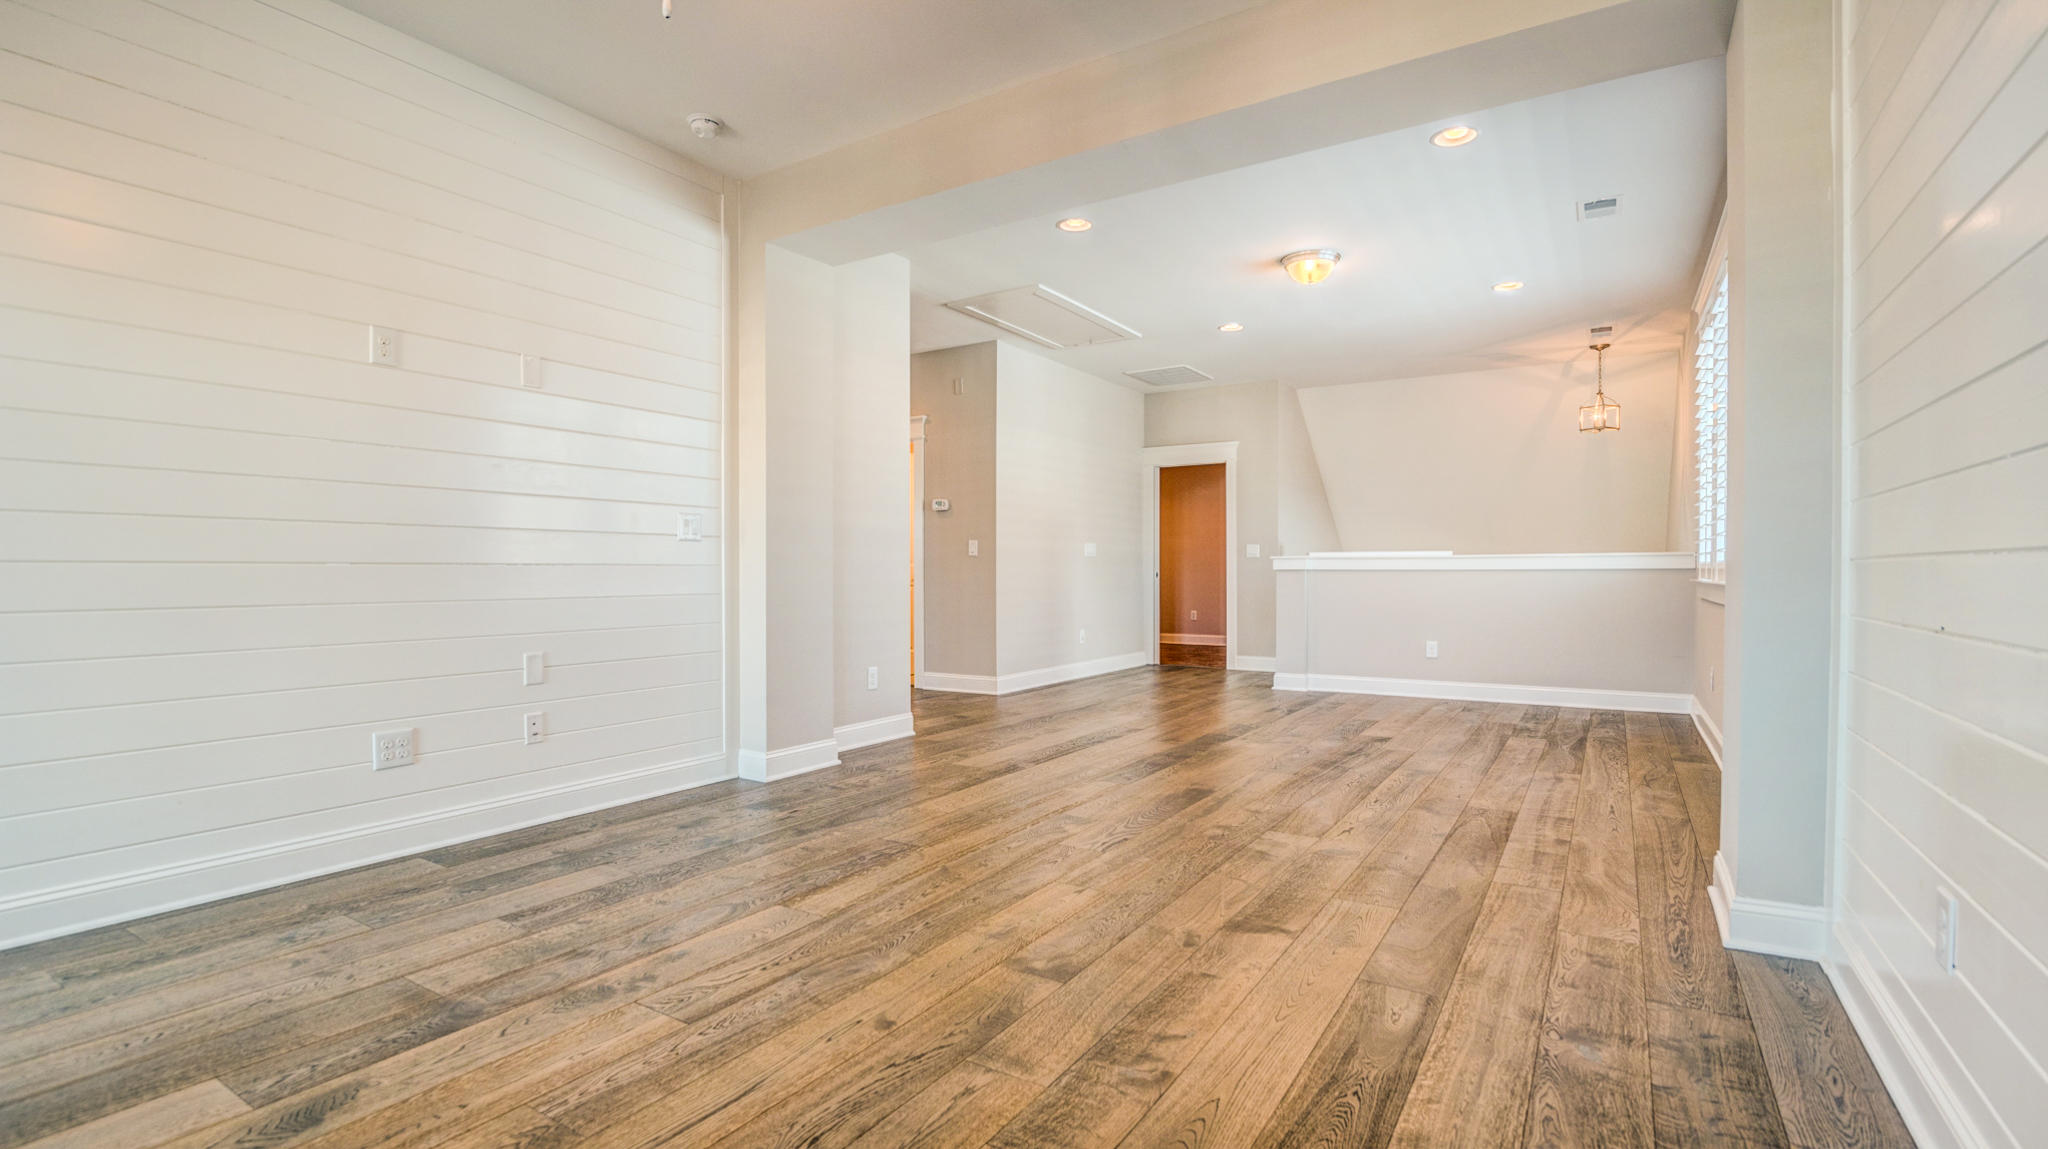 Carolina Park Homes For Sale - 3687 Spindrift, Mount Pleasant, SC - 33